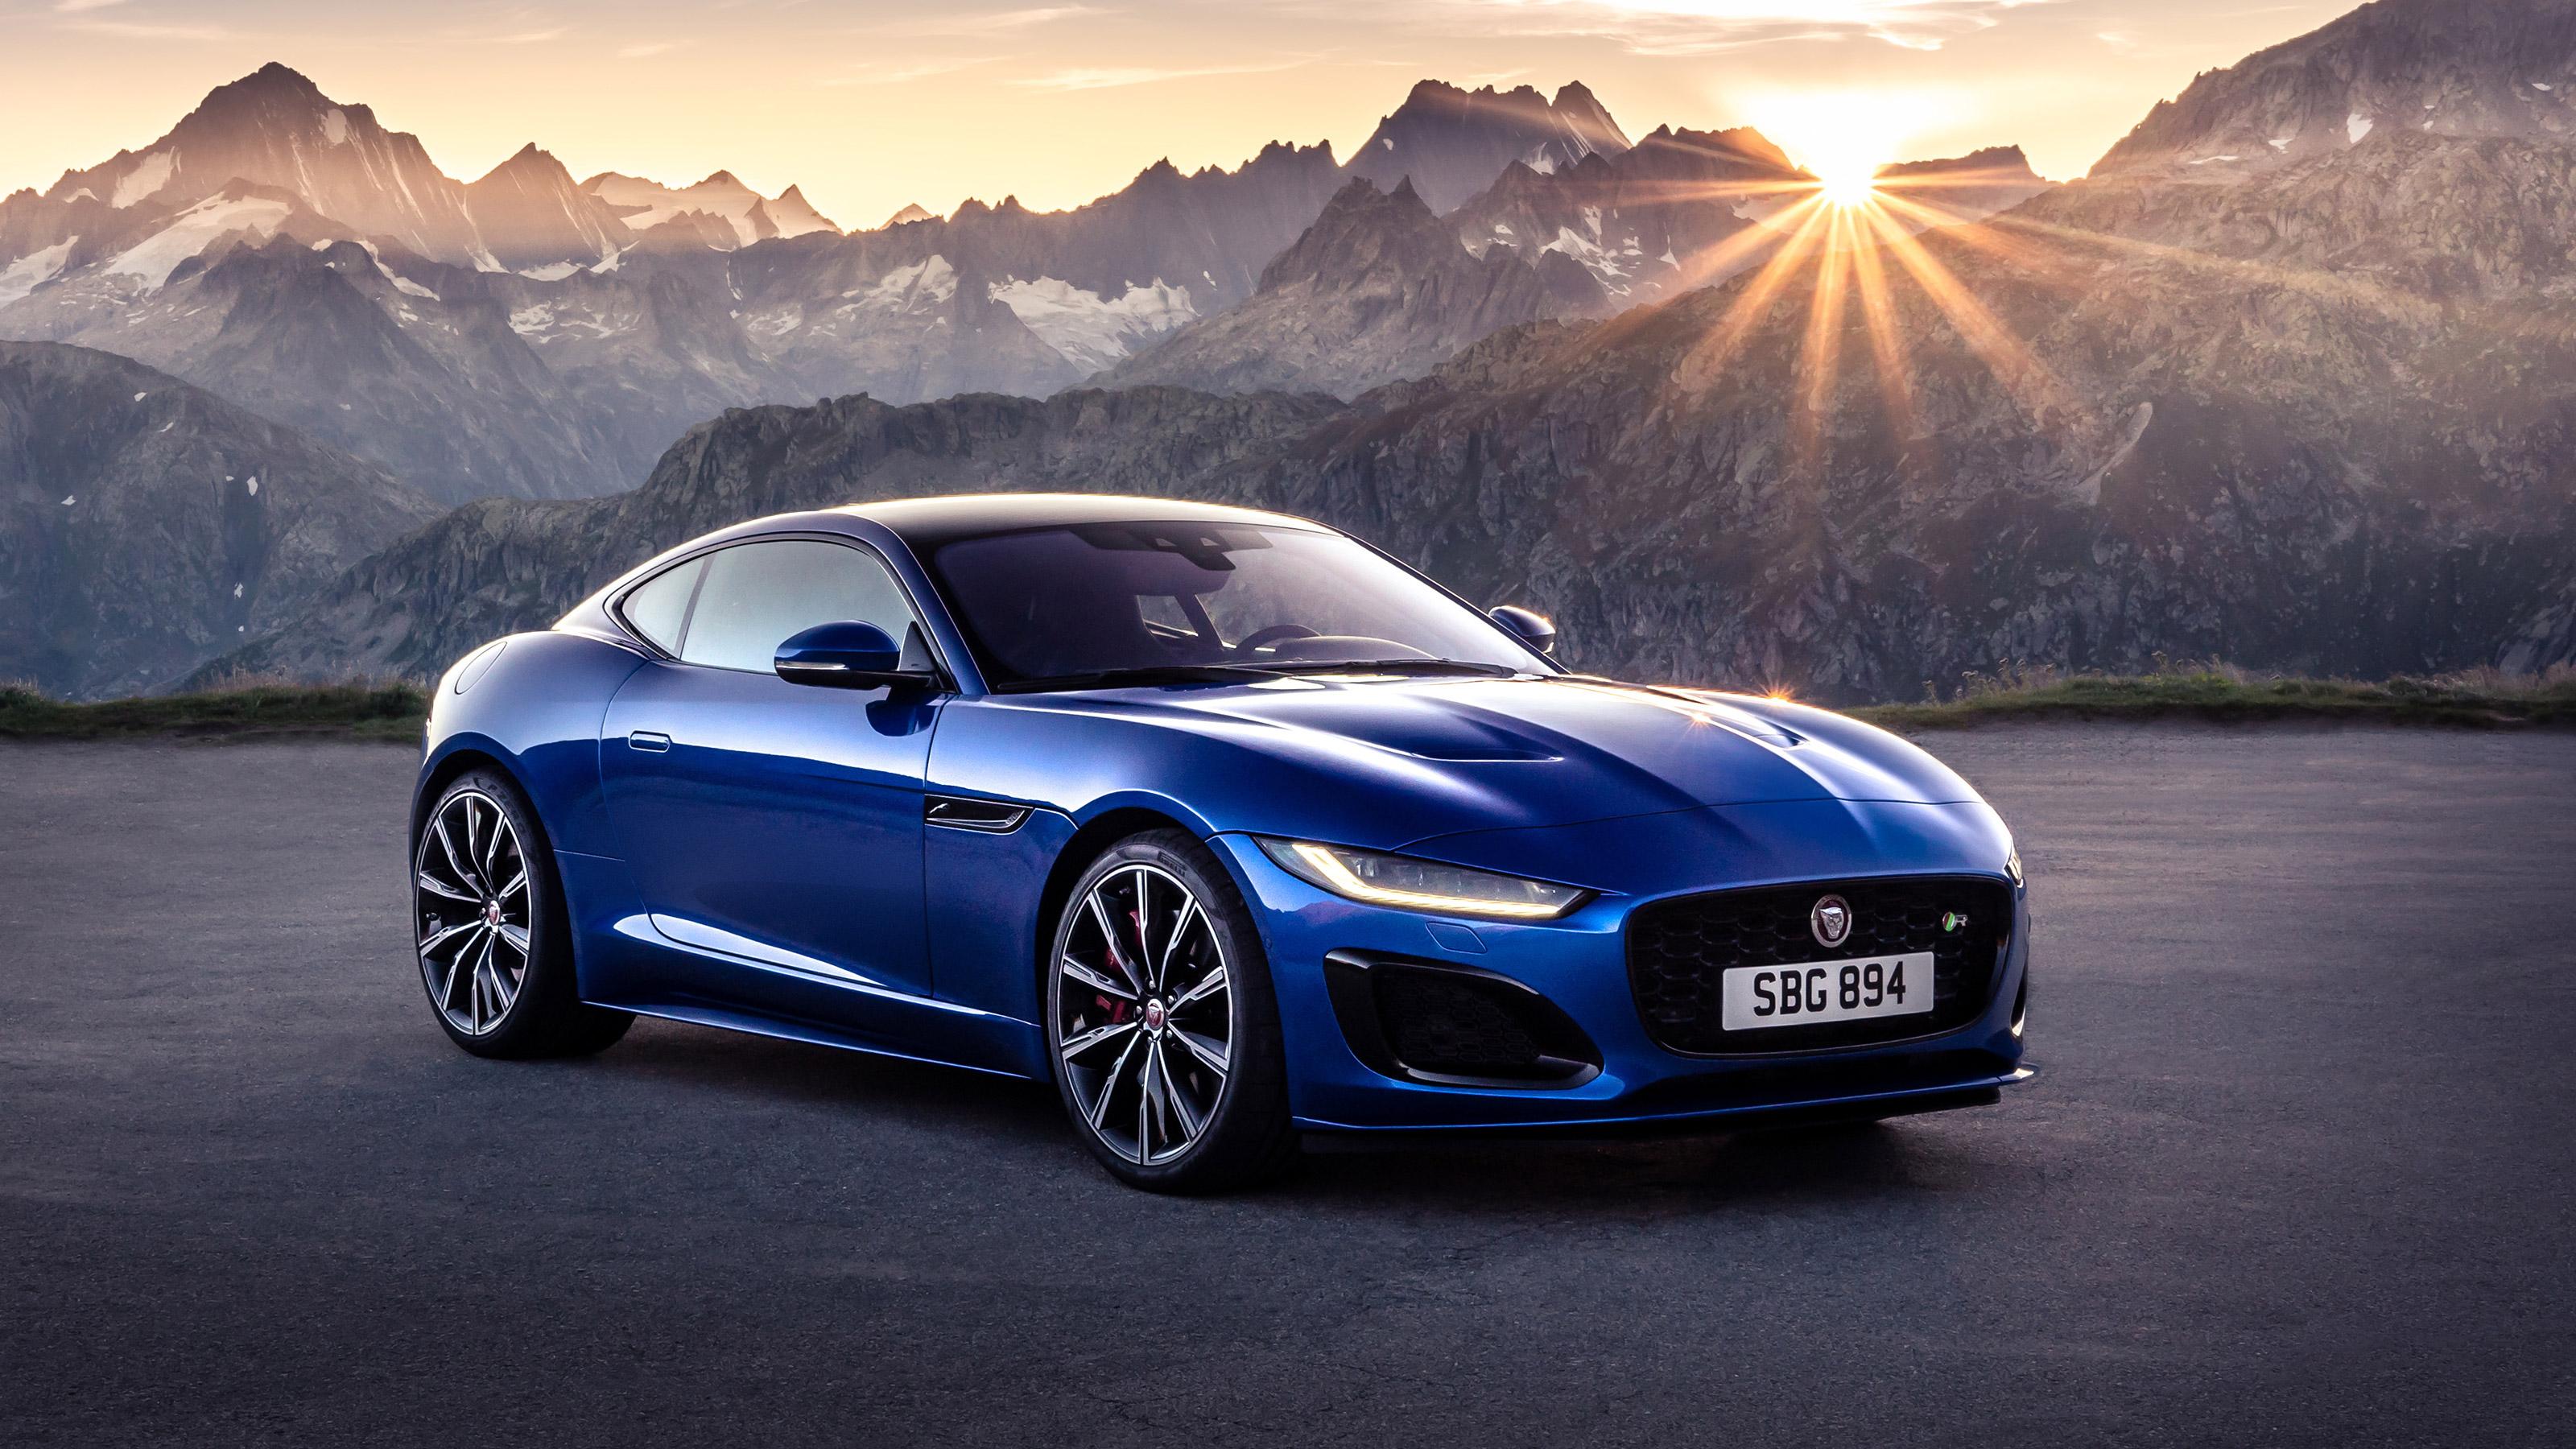 2020 Jaguar F-type revealed | Evo